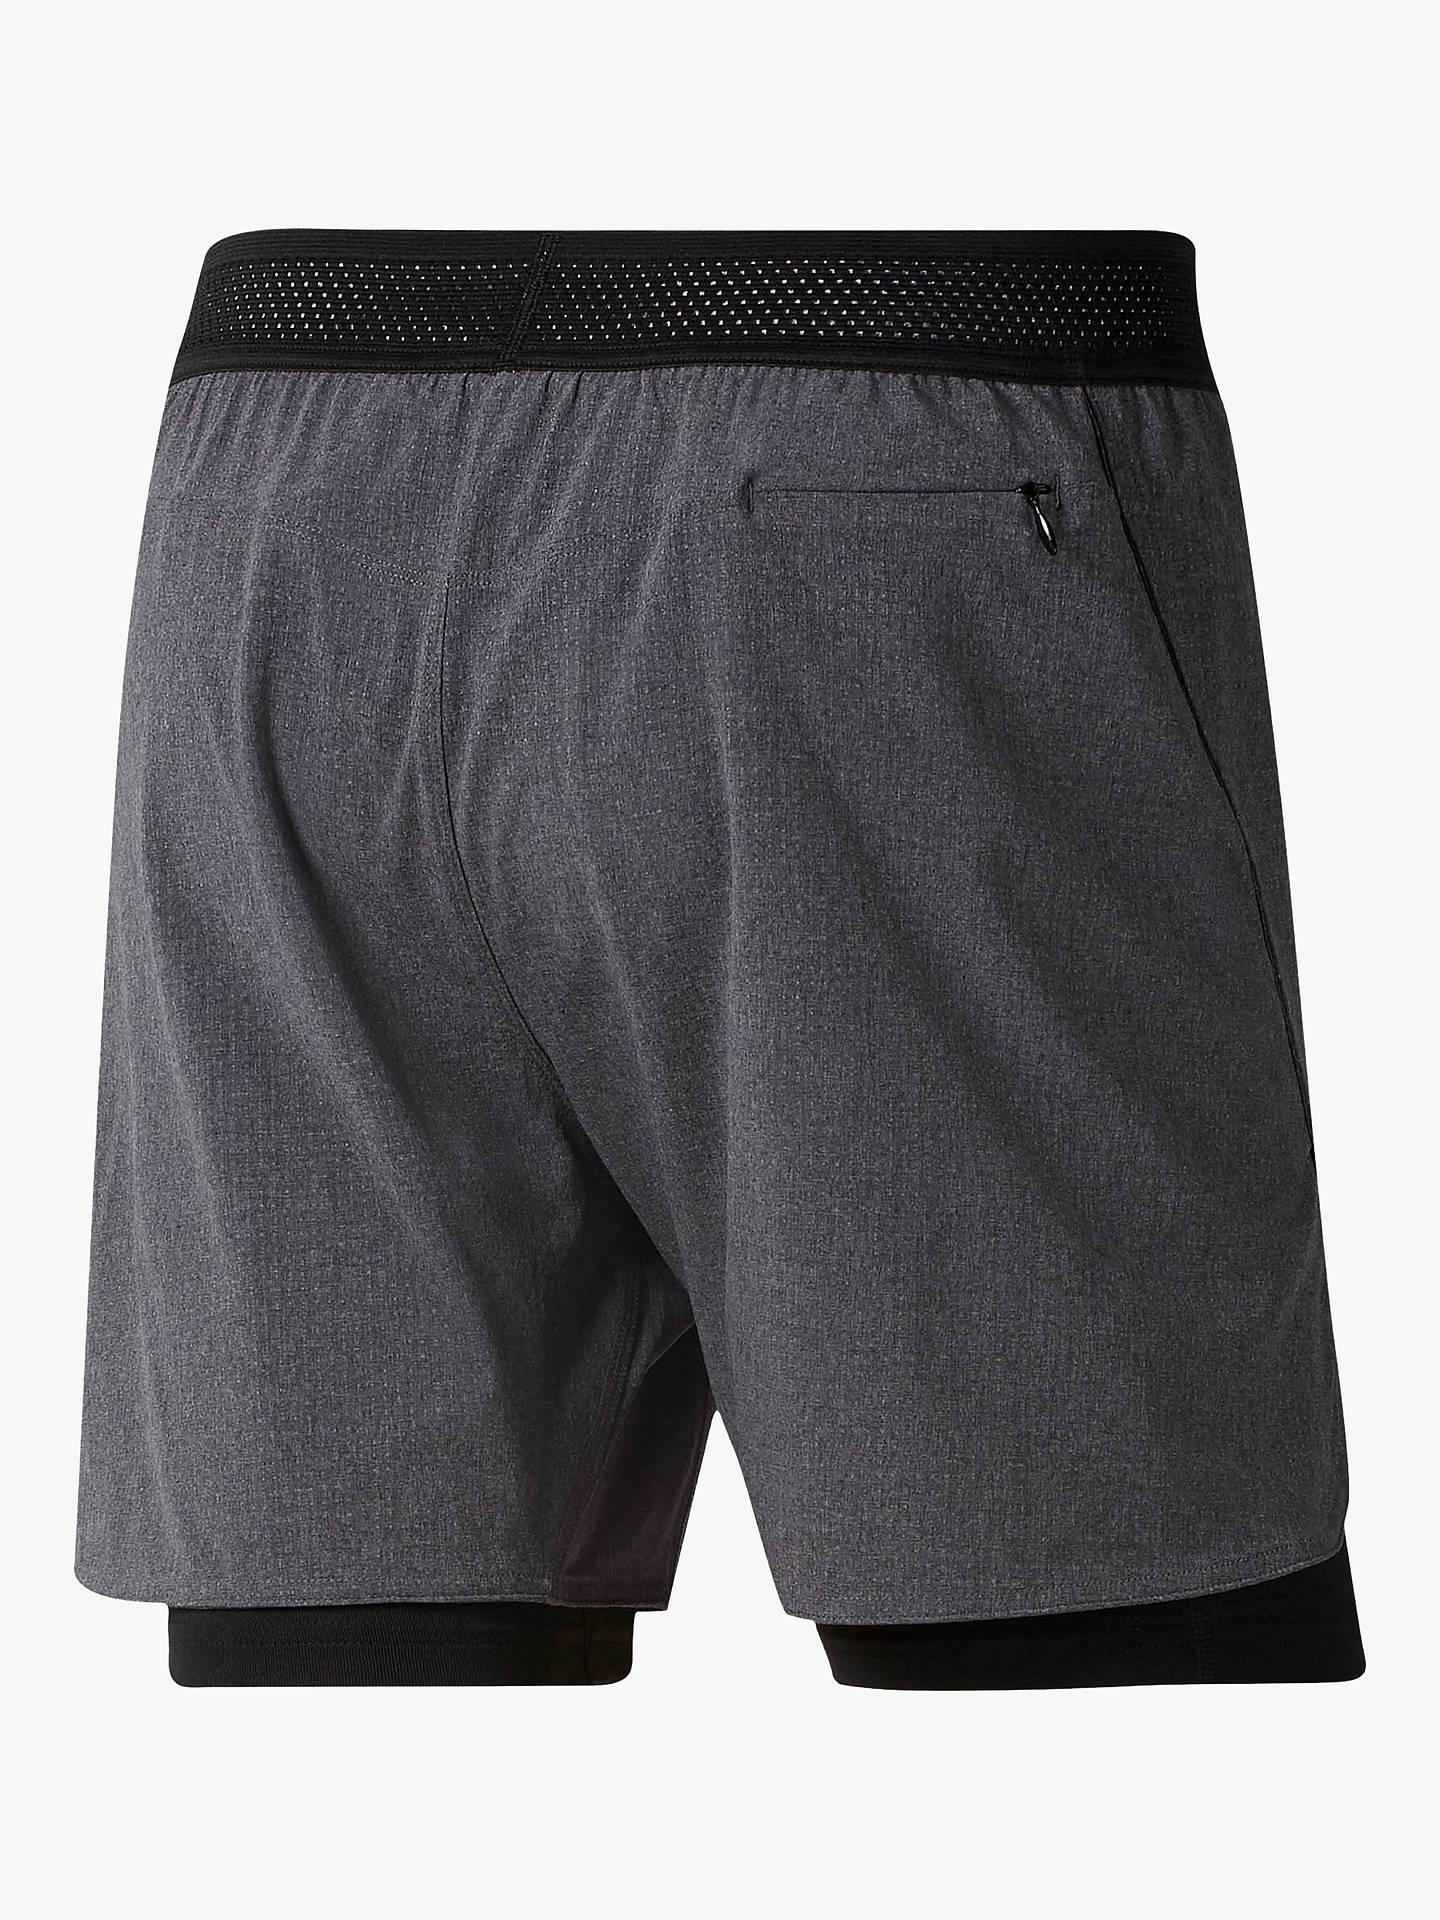 Reebok One Series Running Epic 2 in 1 Running Shorts, Black